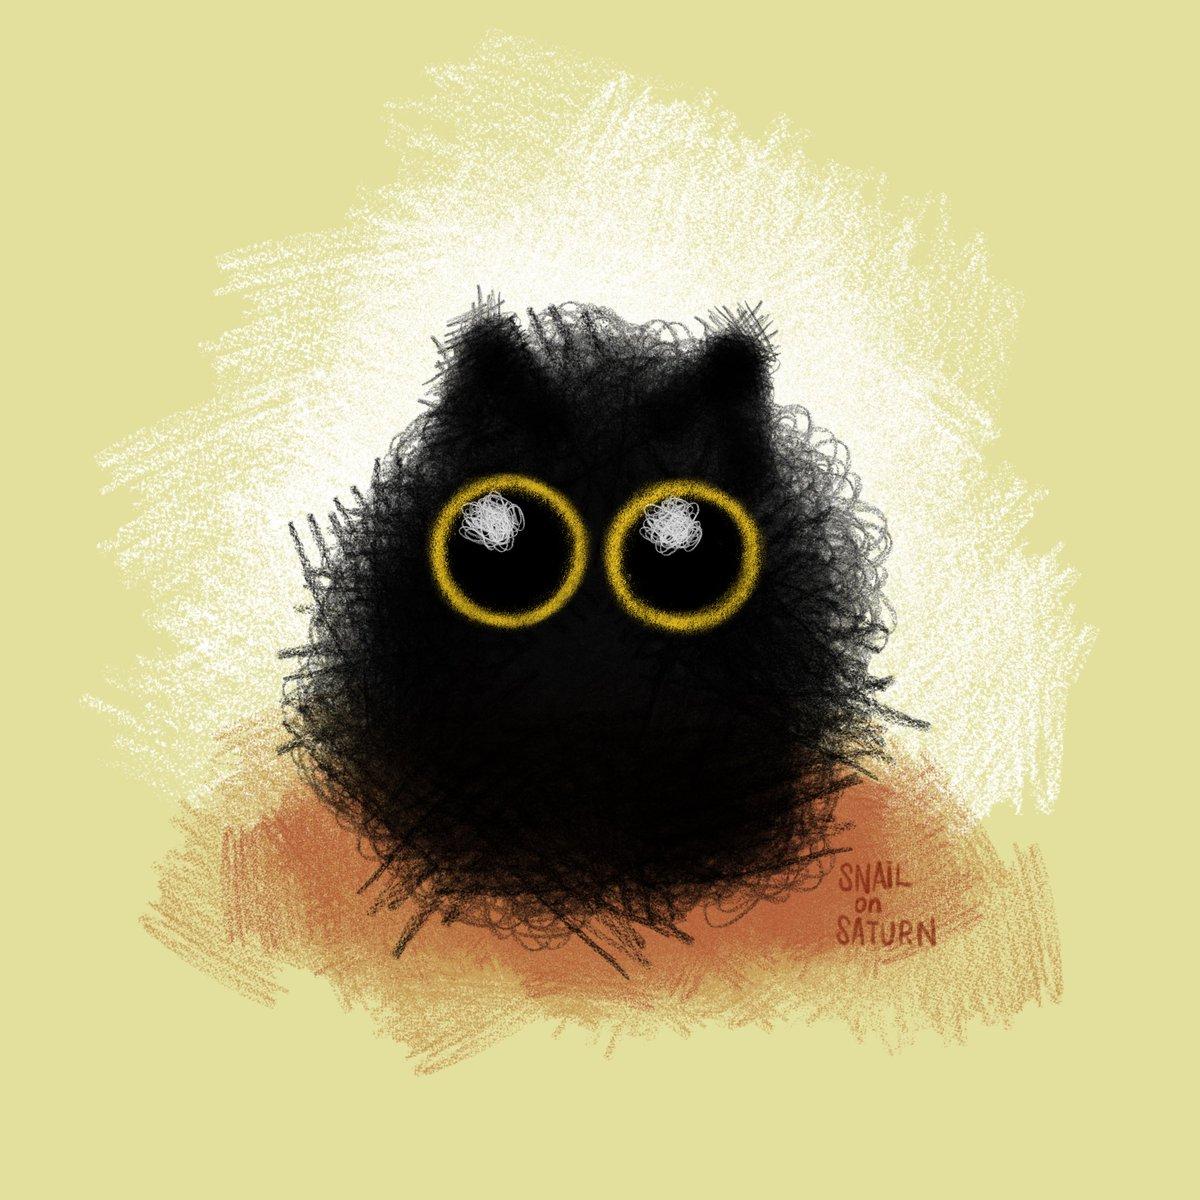 i am obsessed with black cats that just look like vaguely cat-shaped blobs of darkness 🖤  #digitalart #art #illustration #ipadpro #procreate #ipadart #drawing #cats #catart #sketch #blackcat https://t.co/kNxYC684Uz